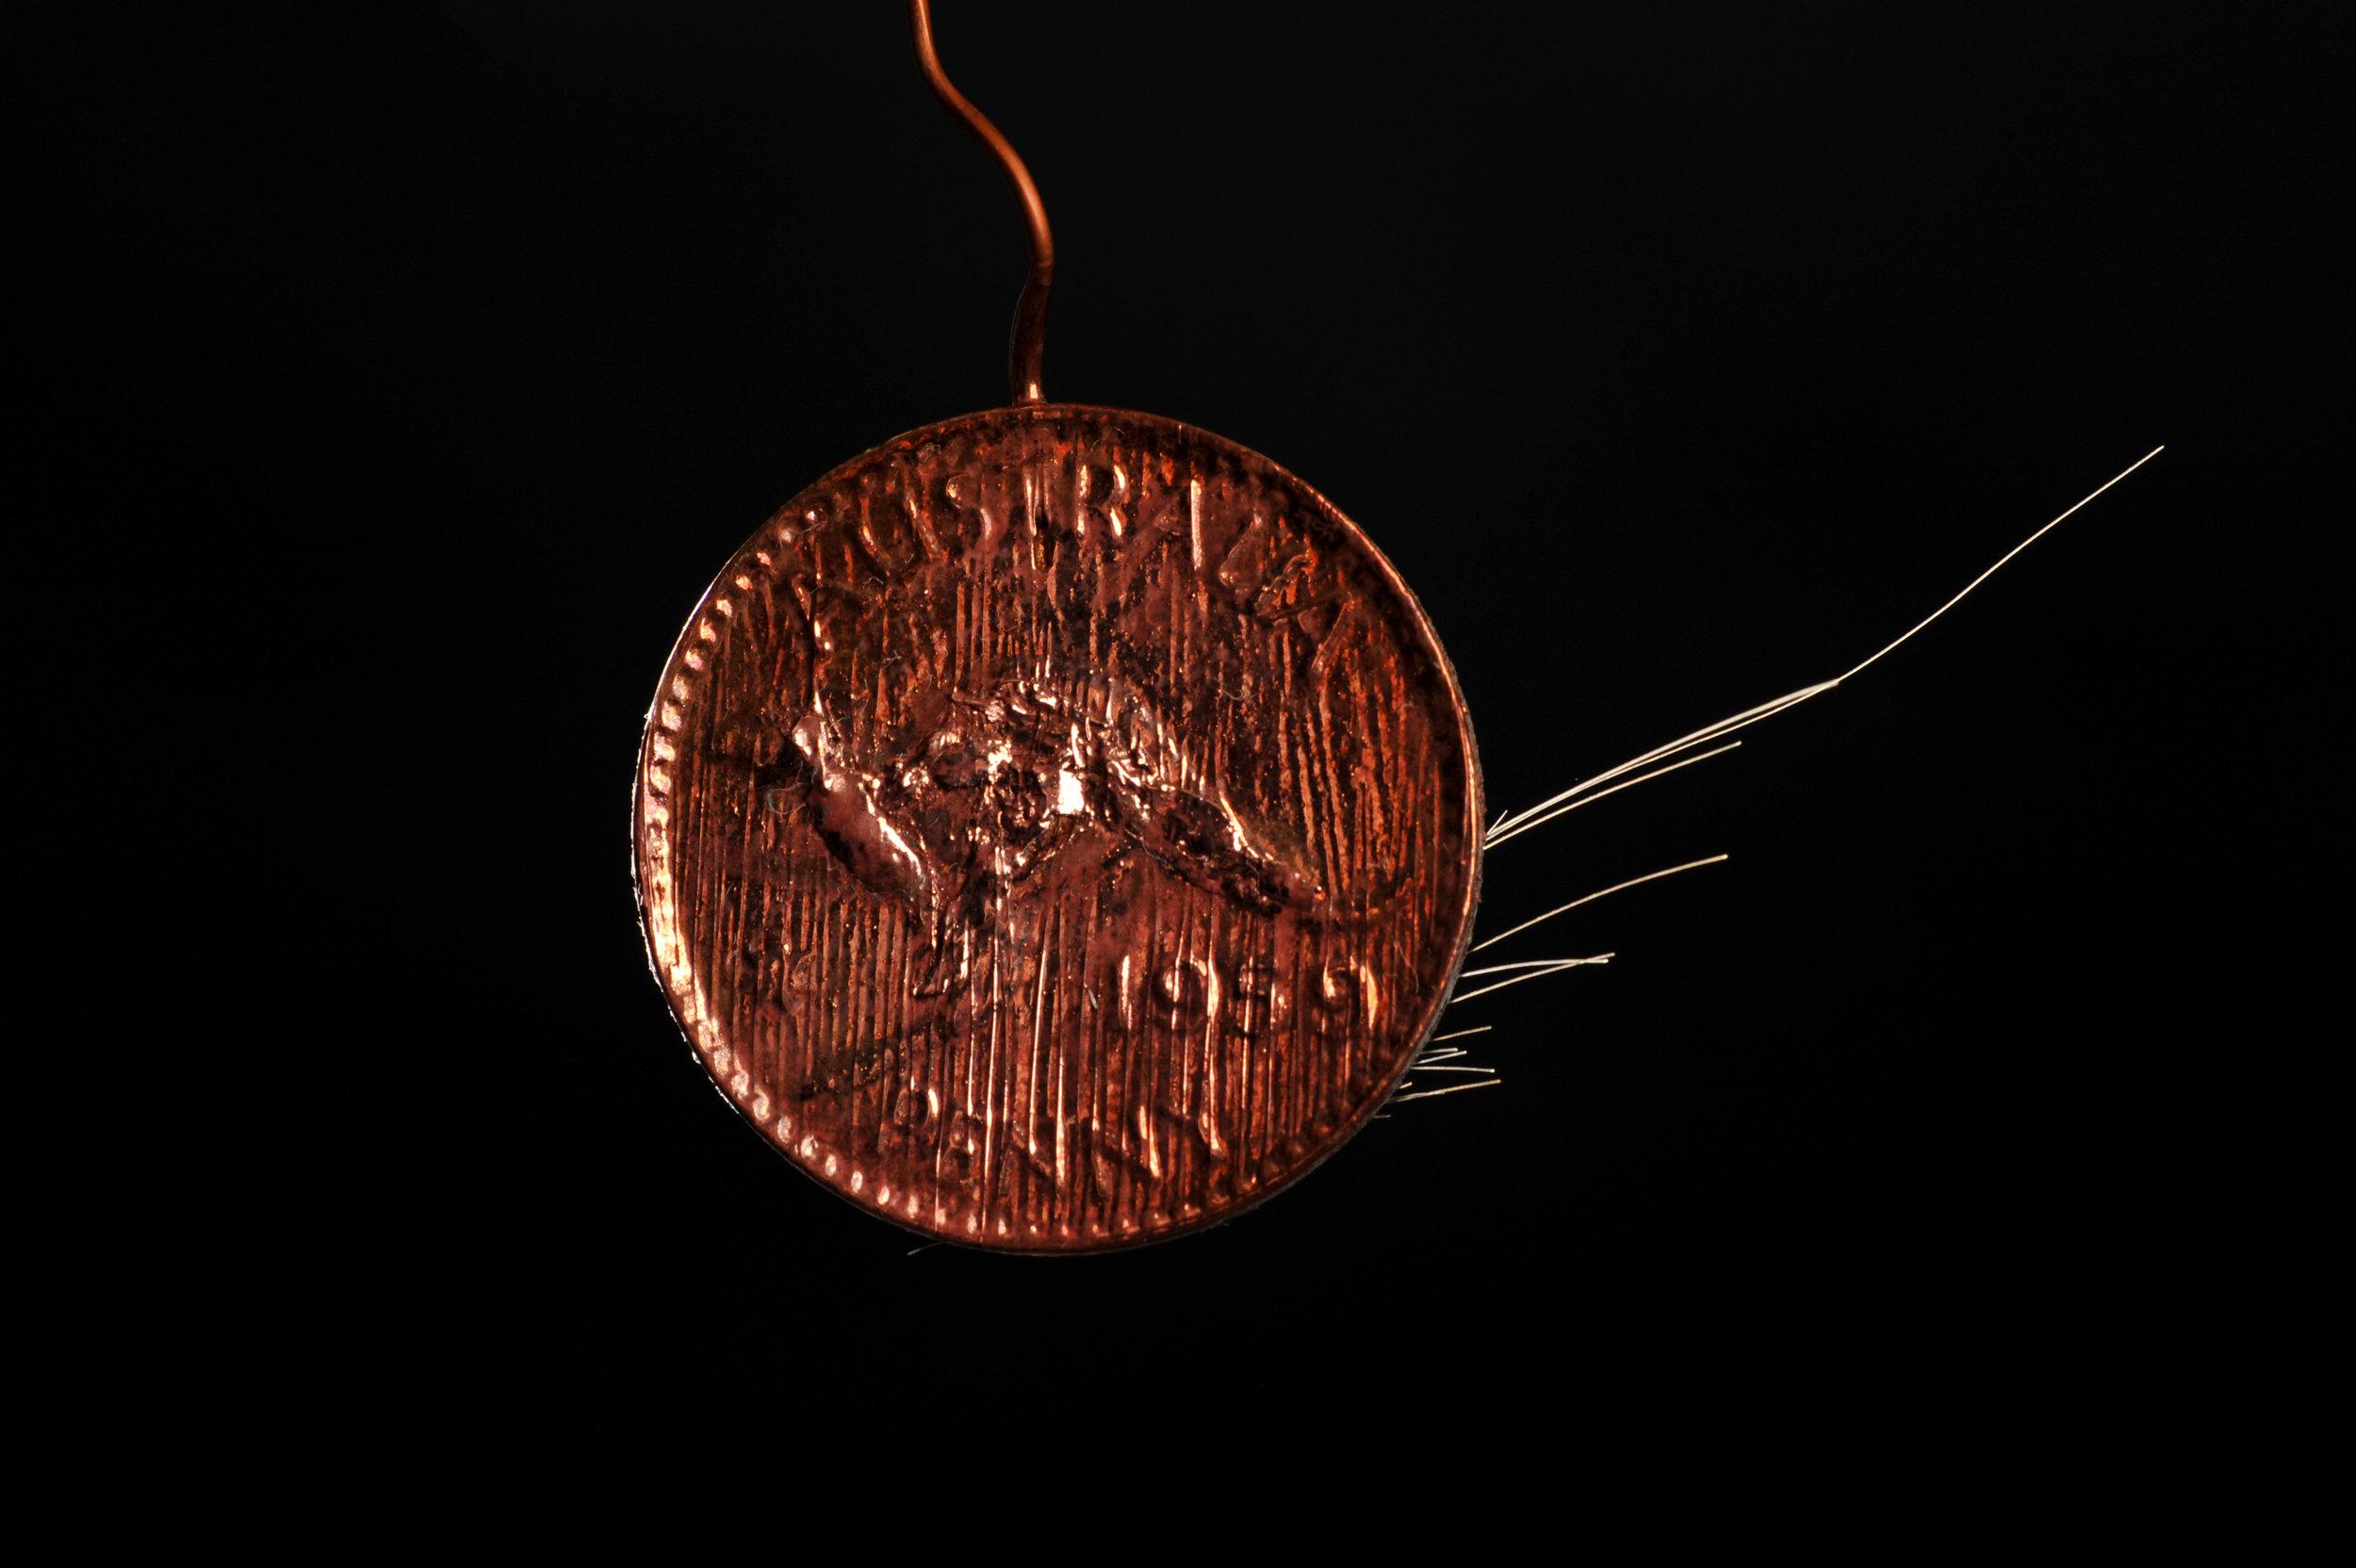 11. Copper Penny, 2016. Dimensions 5 cm x 7 cm_ copper penny, artist's hair. Image Nu Image (2).JPG